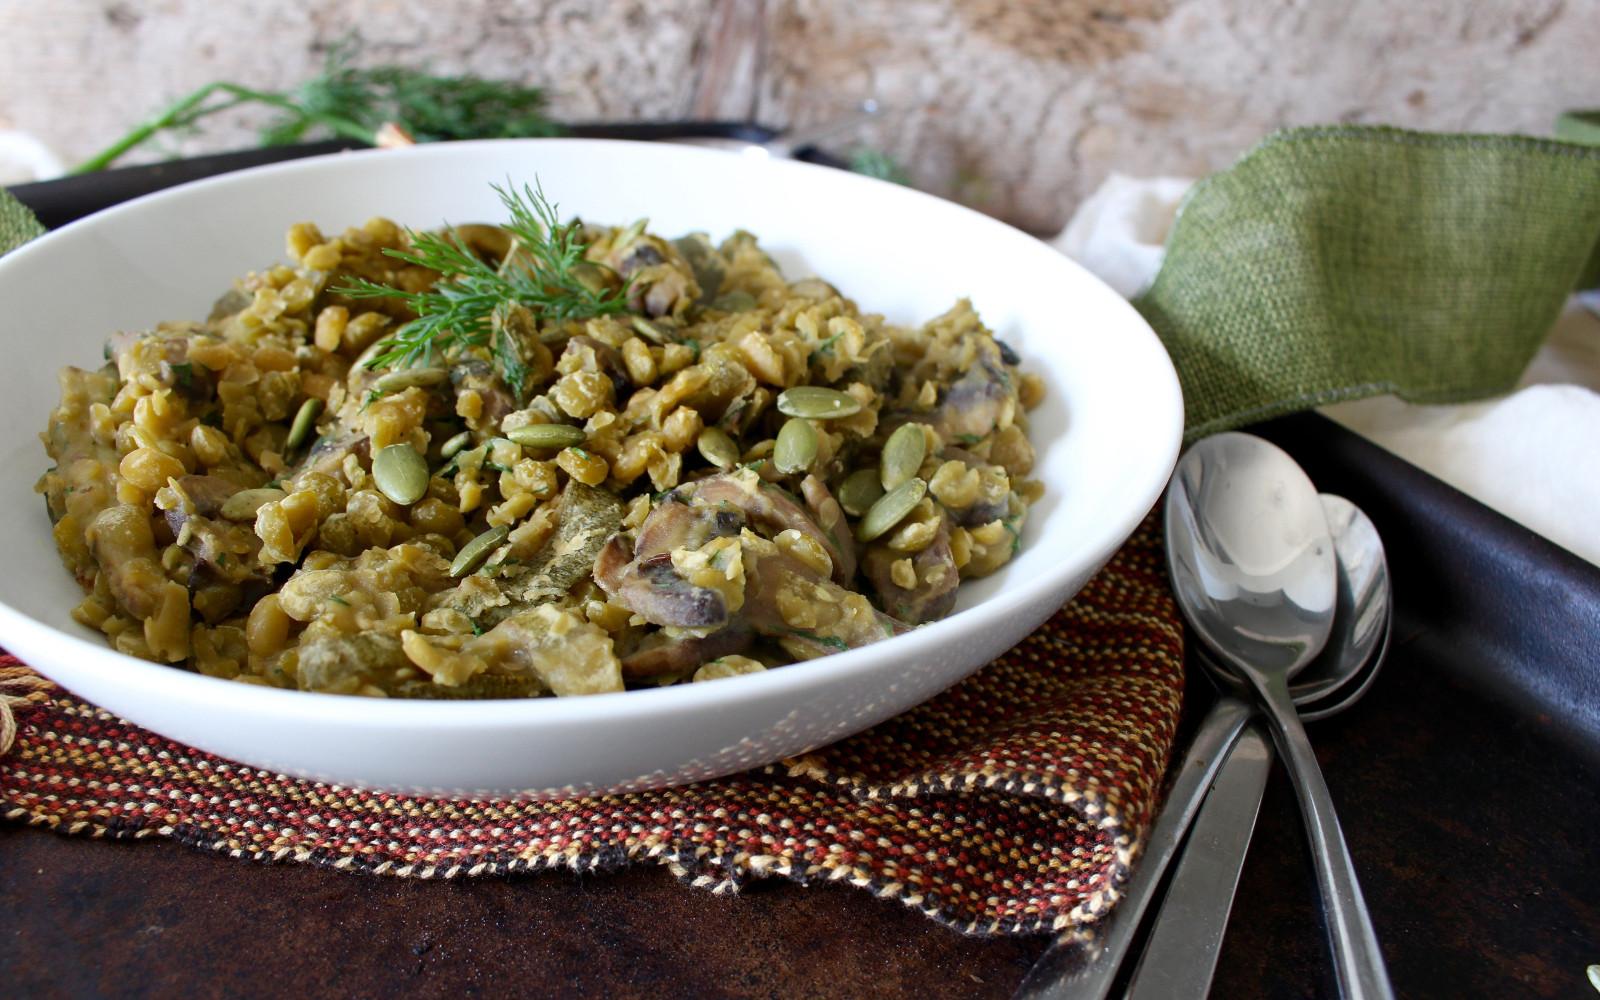 Lemony Balsamic Split Pea and Mushroom Risotto